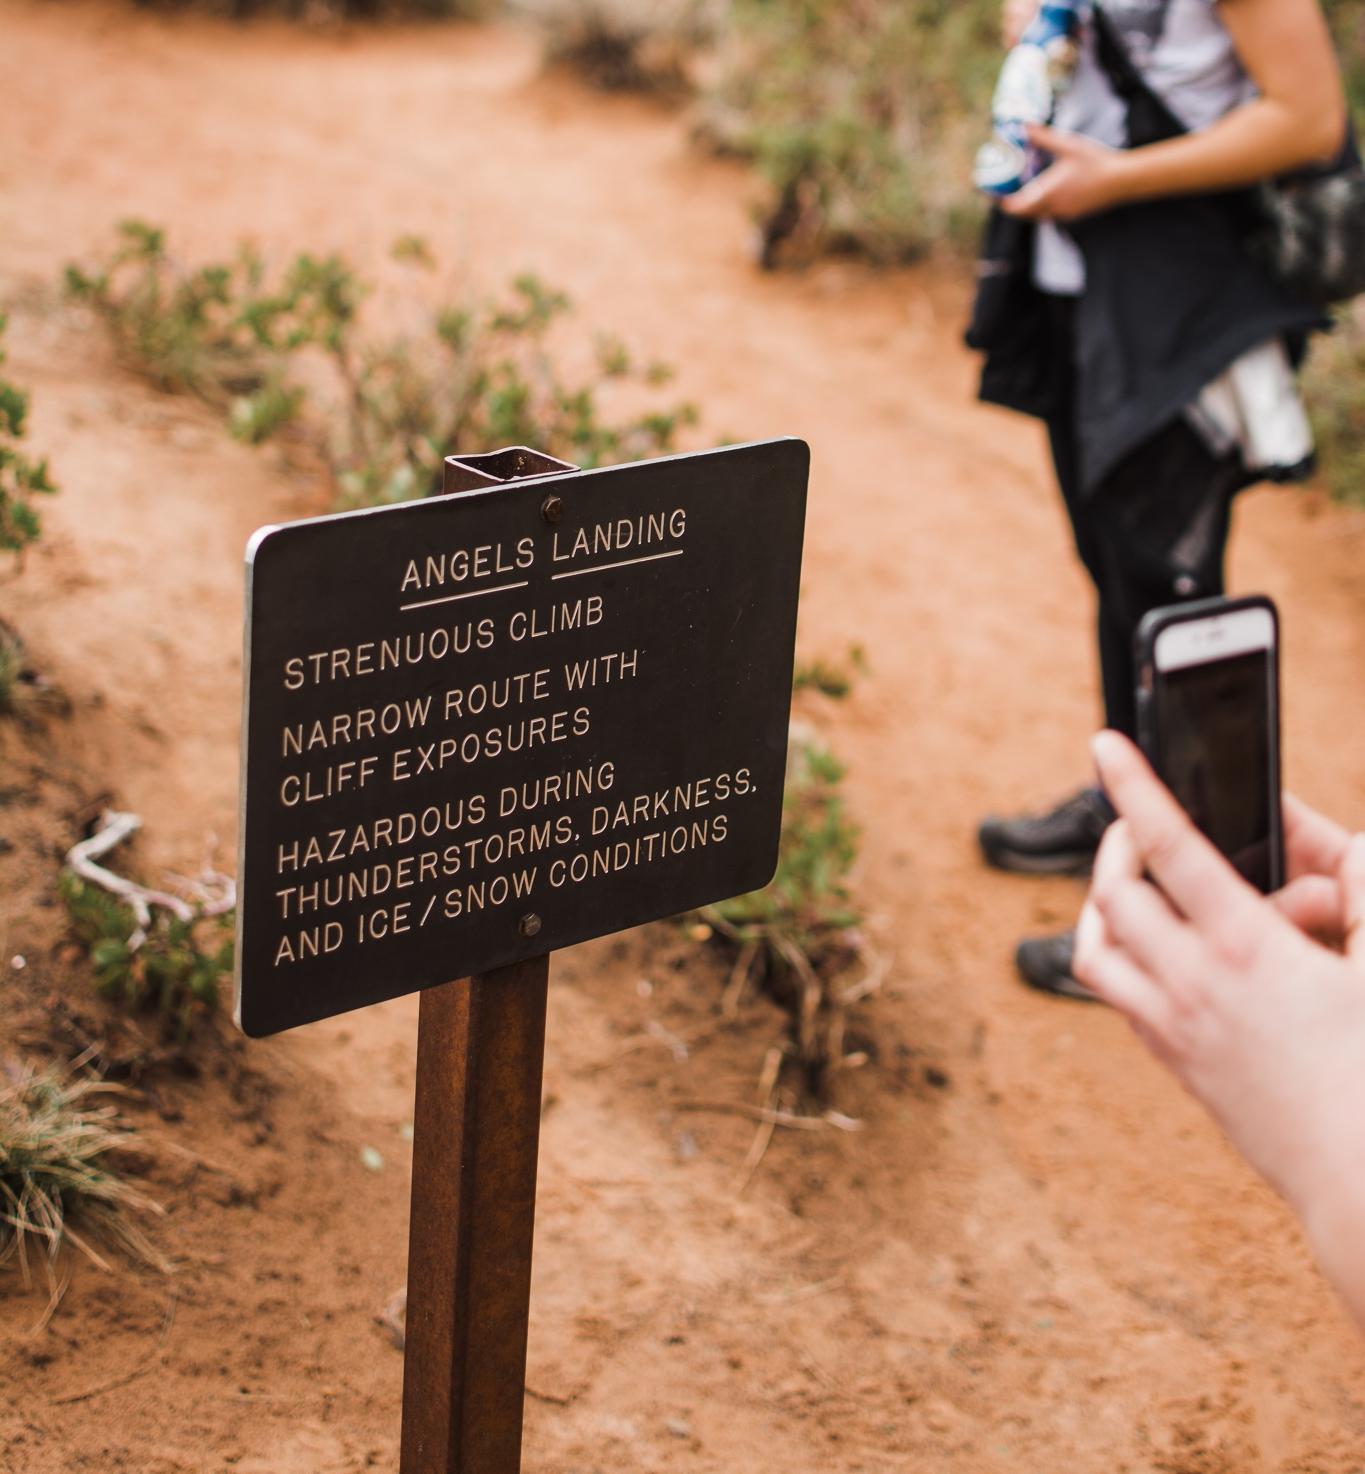 Boise Wedding Photographer, Idaho Wedding Photographer, Boise Senior Photographer, Idaho Engagement Photographer, best Boise Photographer, Photographers in Boise, Idaho Graphic Designer, Boise Graphic Designer, McCall, Eagle, Meridian, Weiser, Social Media Manager, Boise family photographer